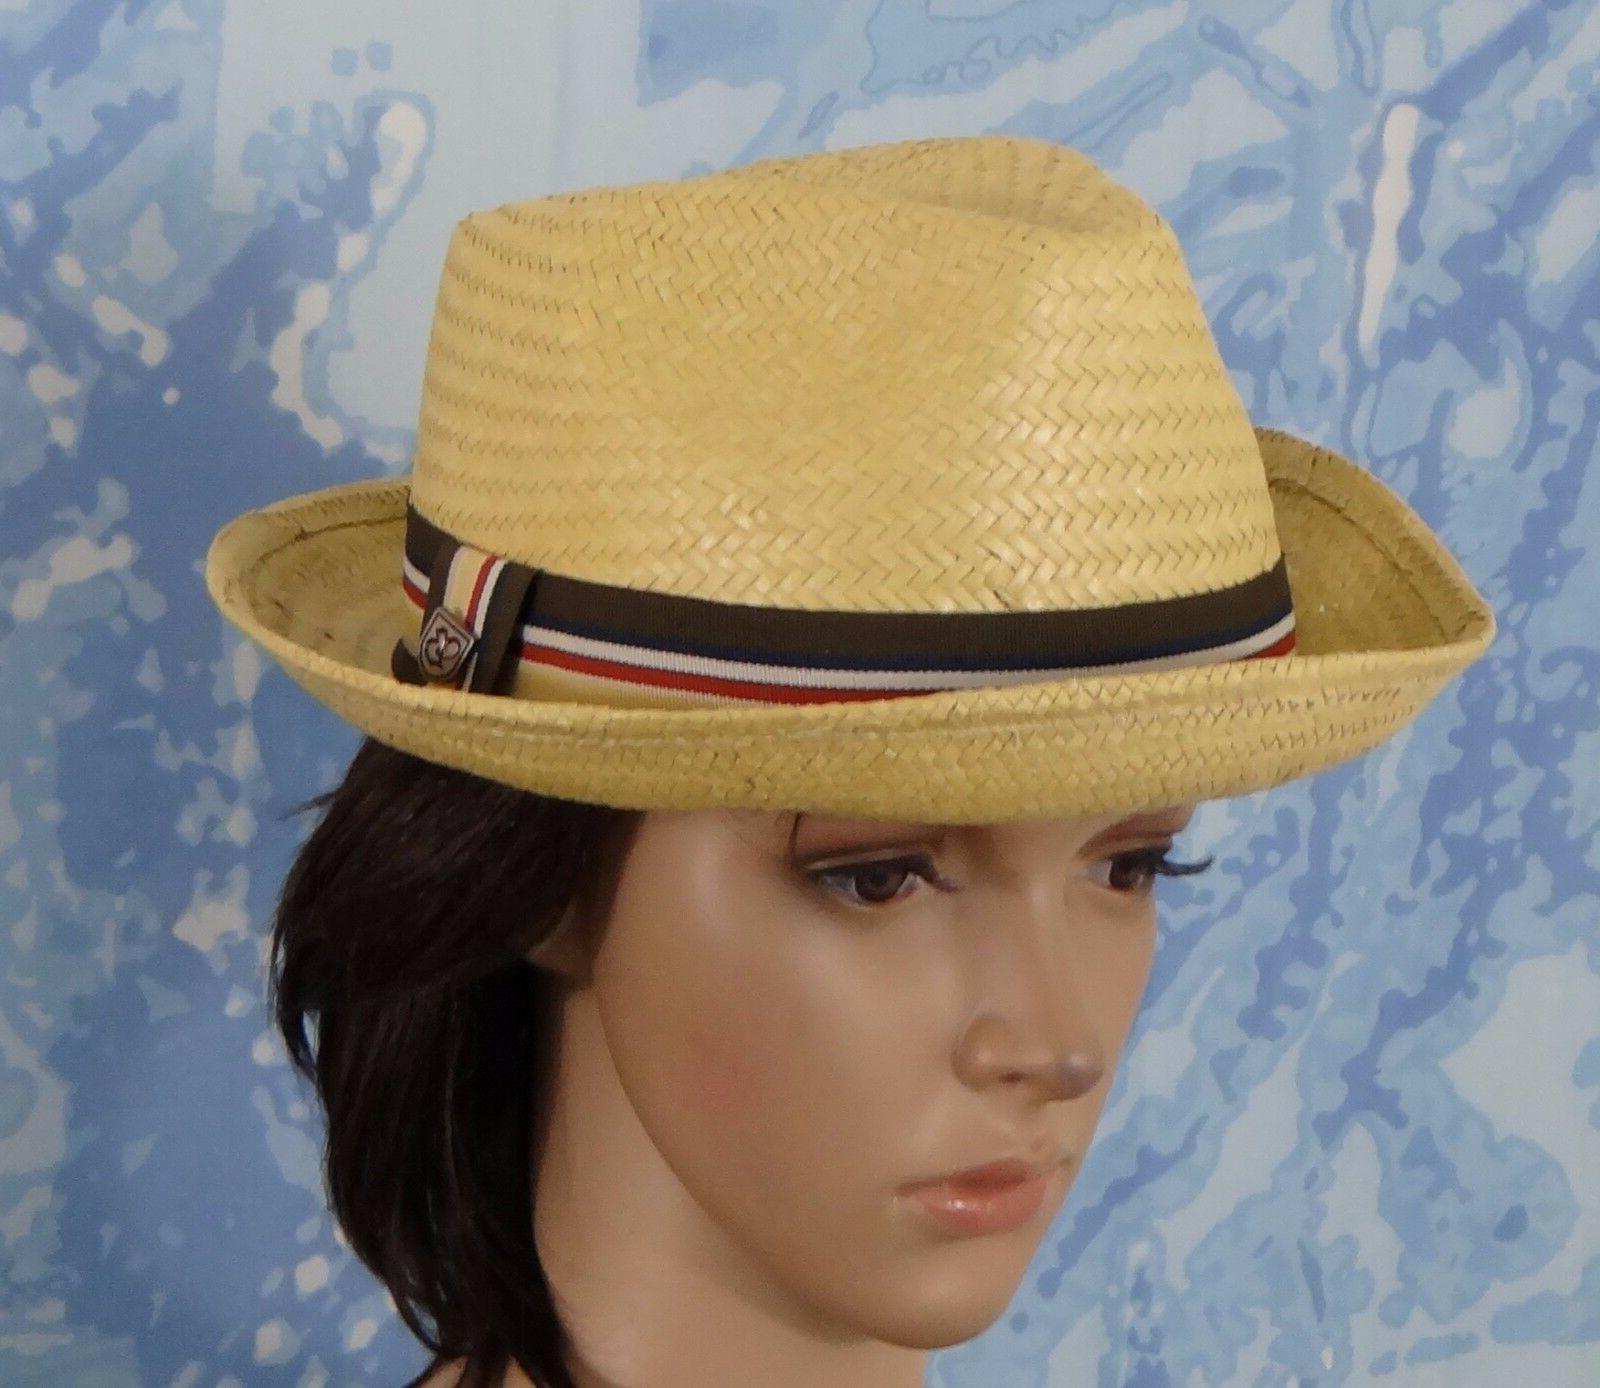 NWT Brixton Mens Castor straw Fedora Tan Hat, size XL